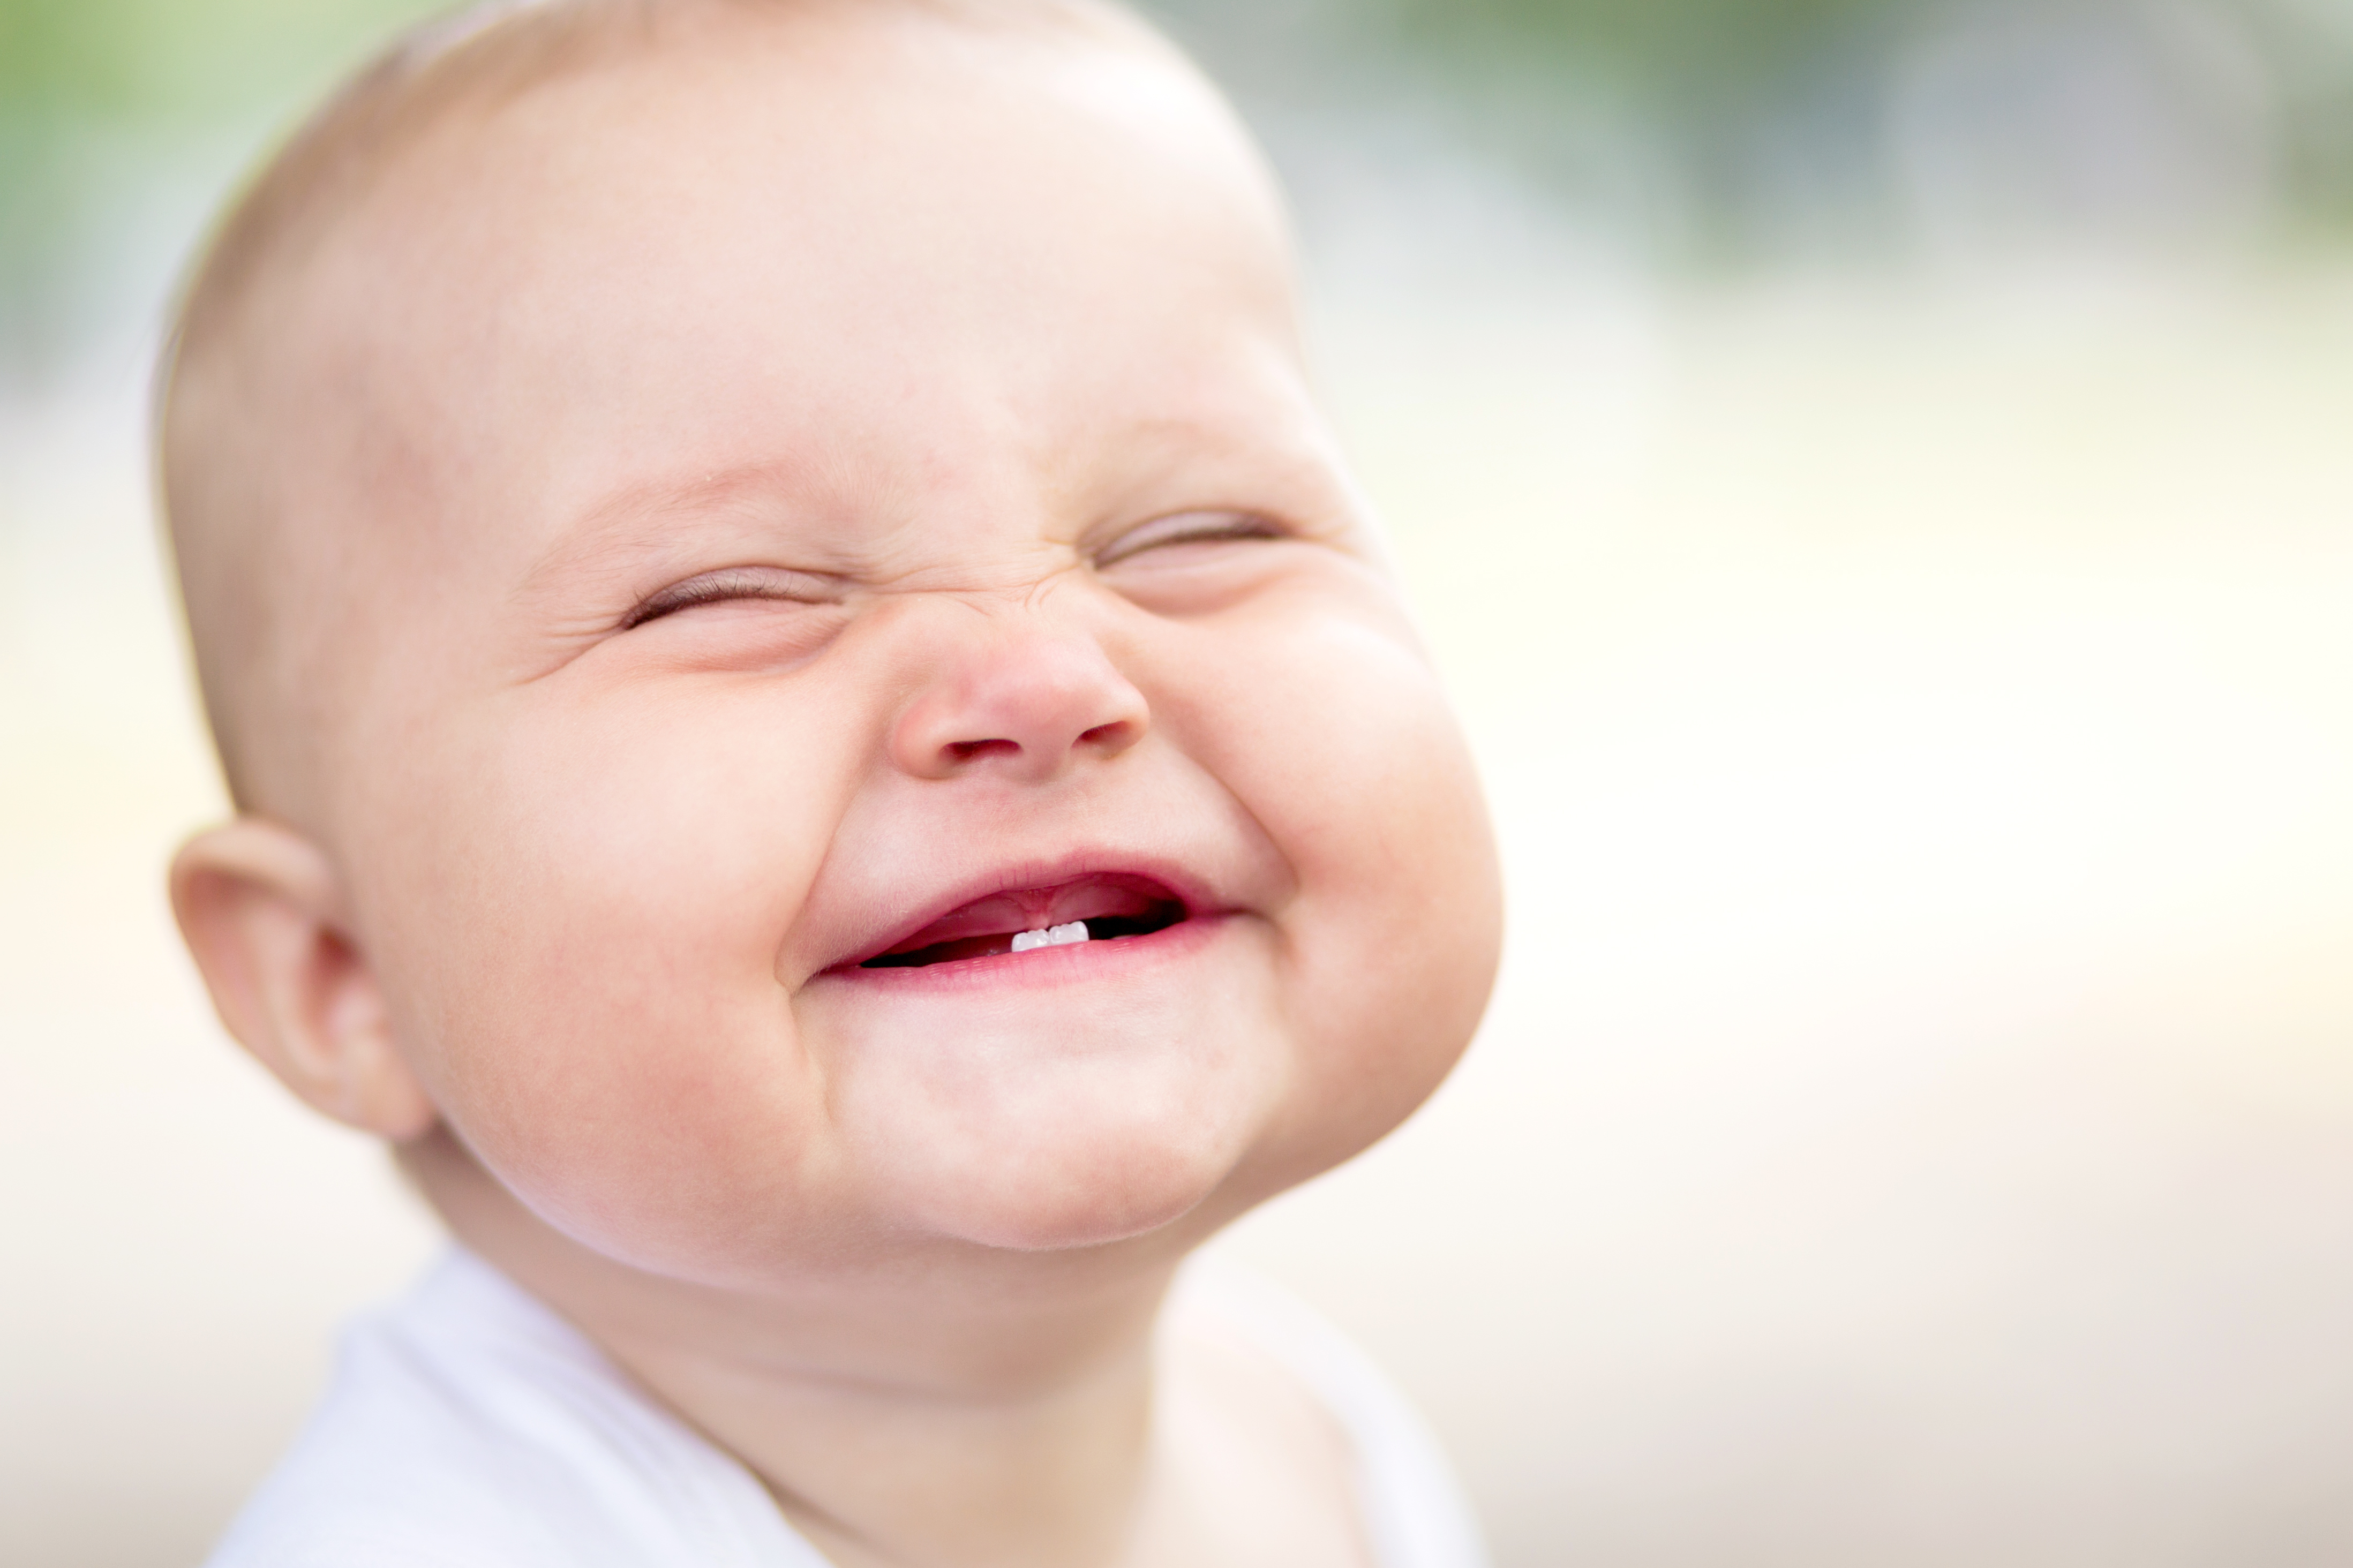 Baby shutterstock_115992457